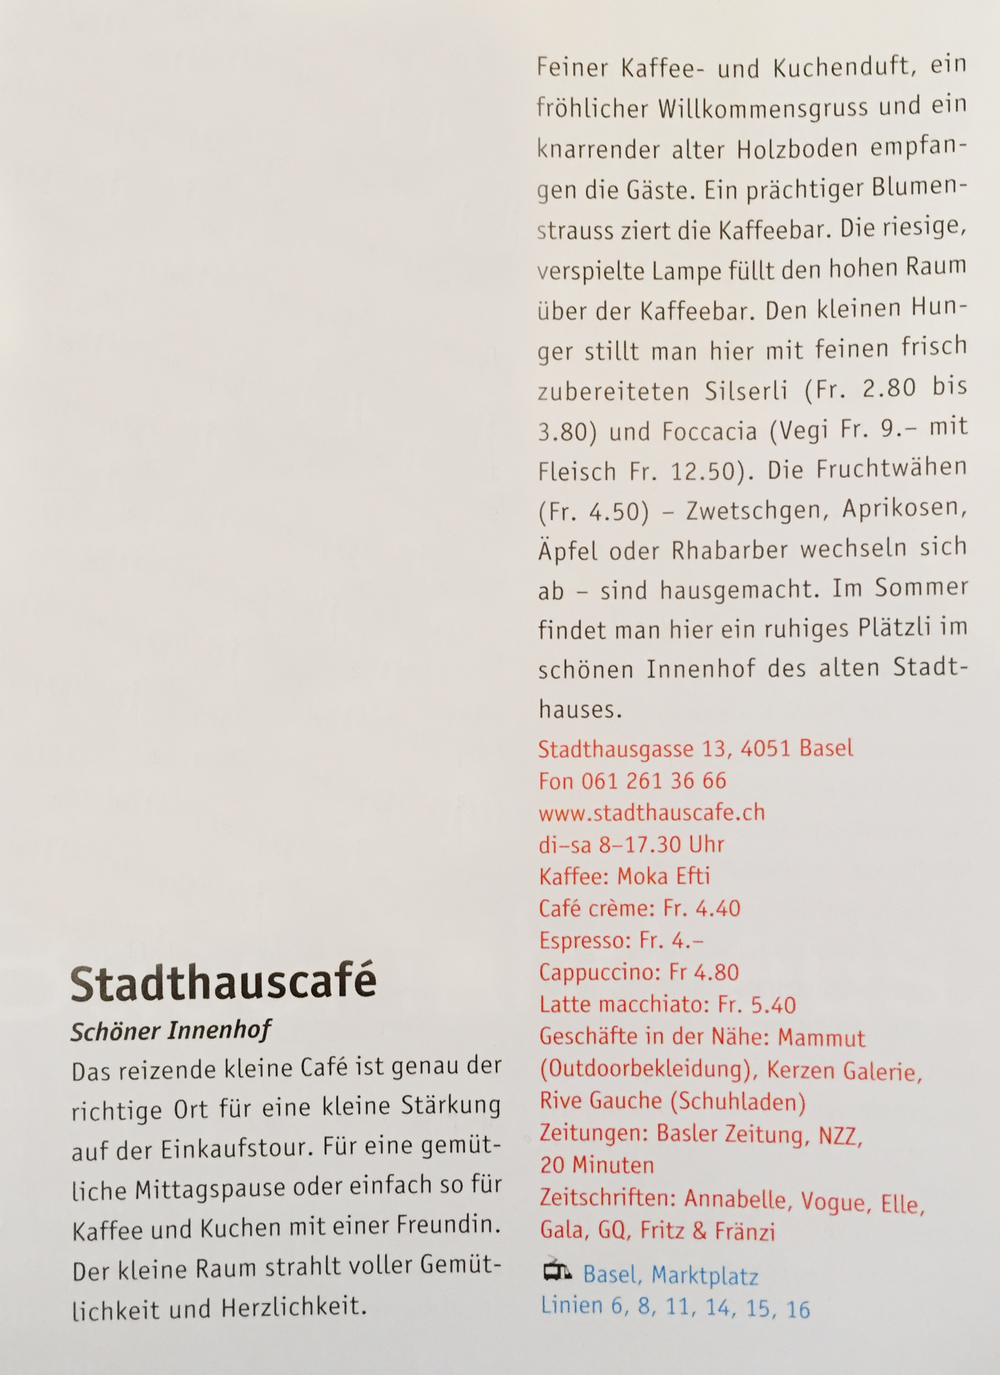 stadthauscafe_9.jpg